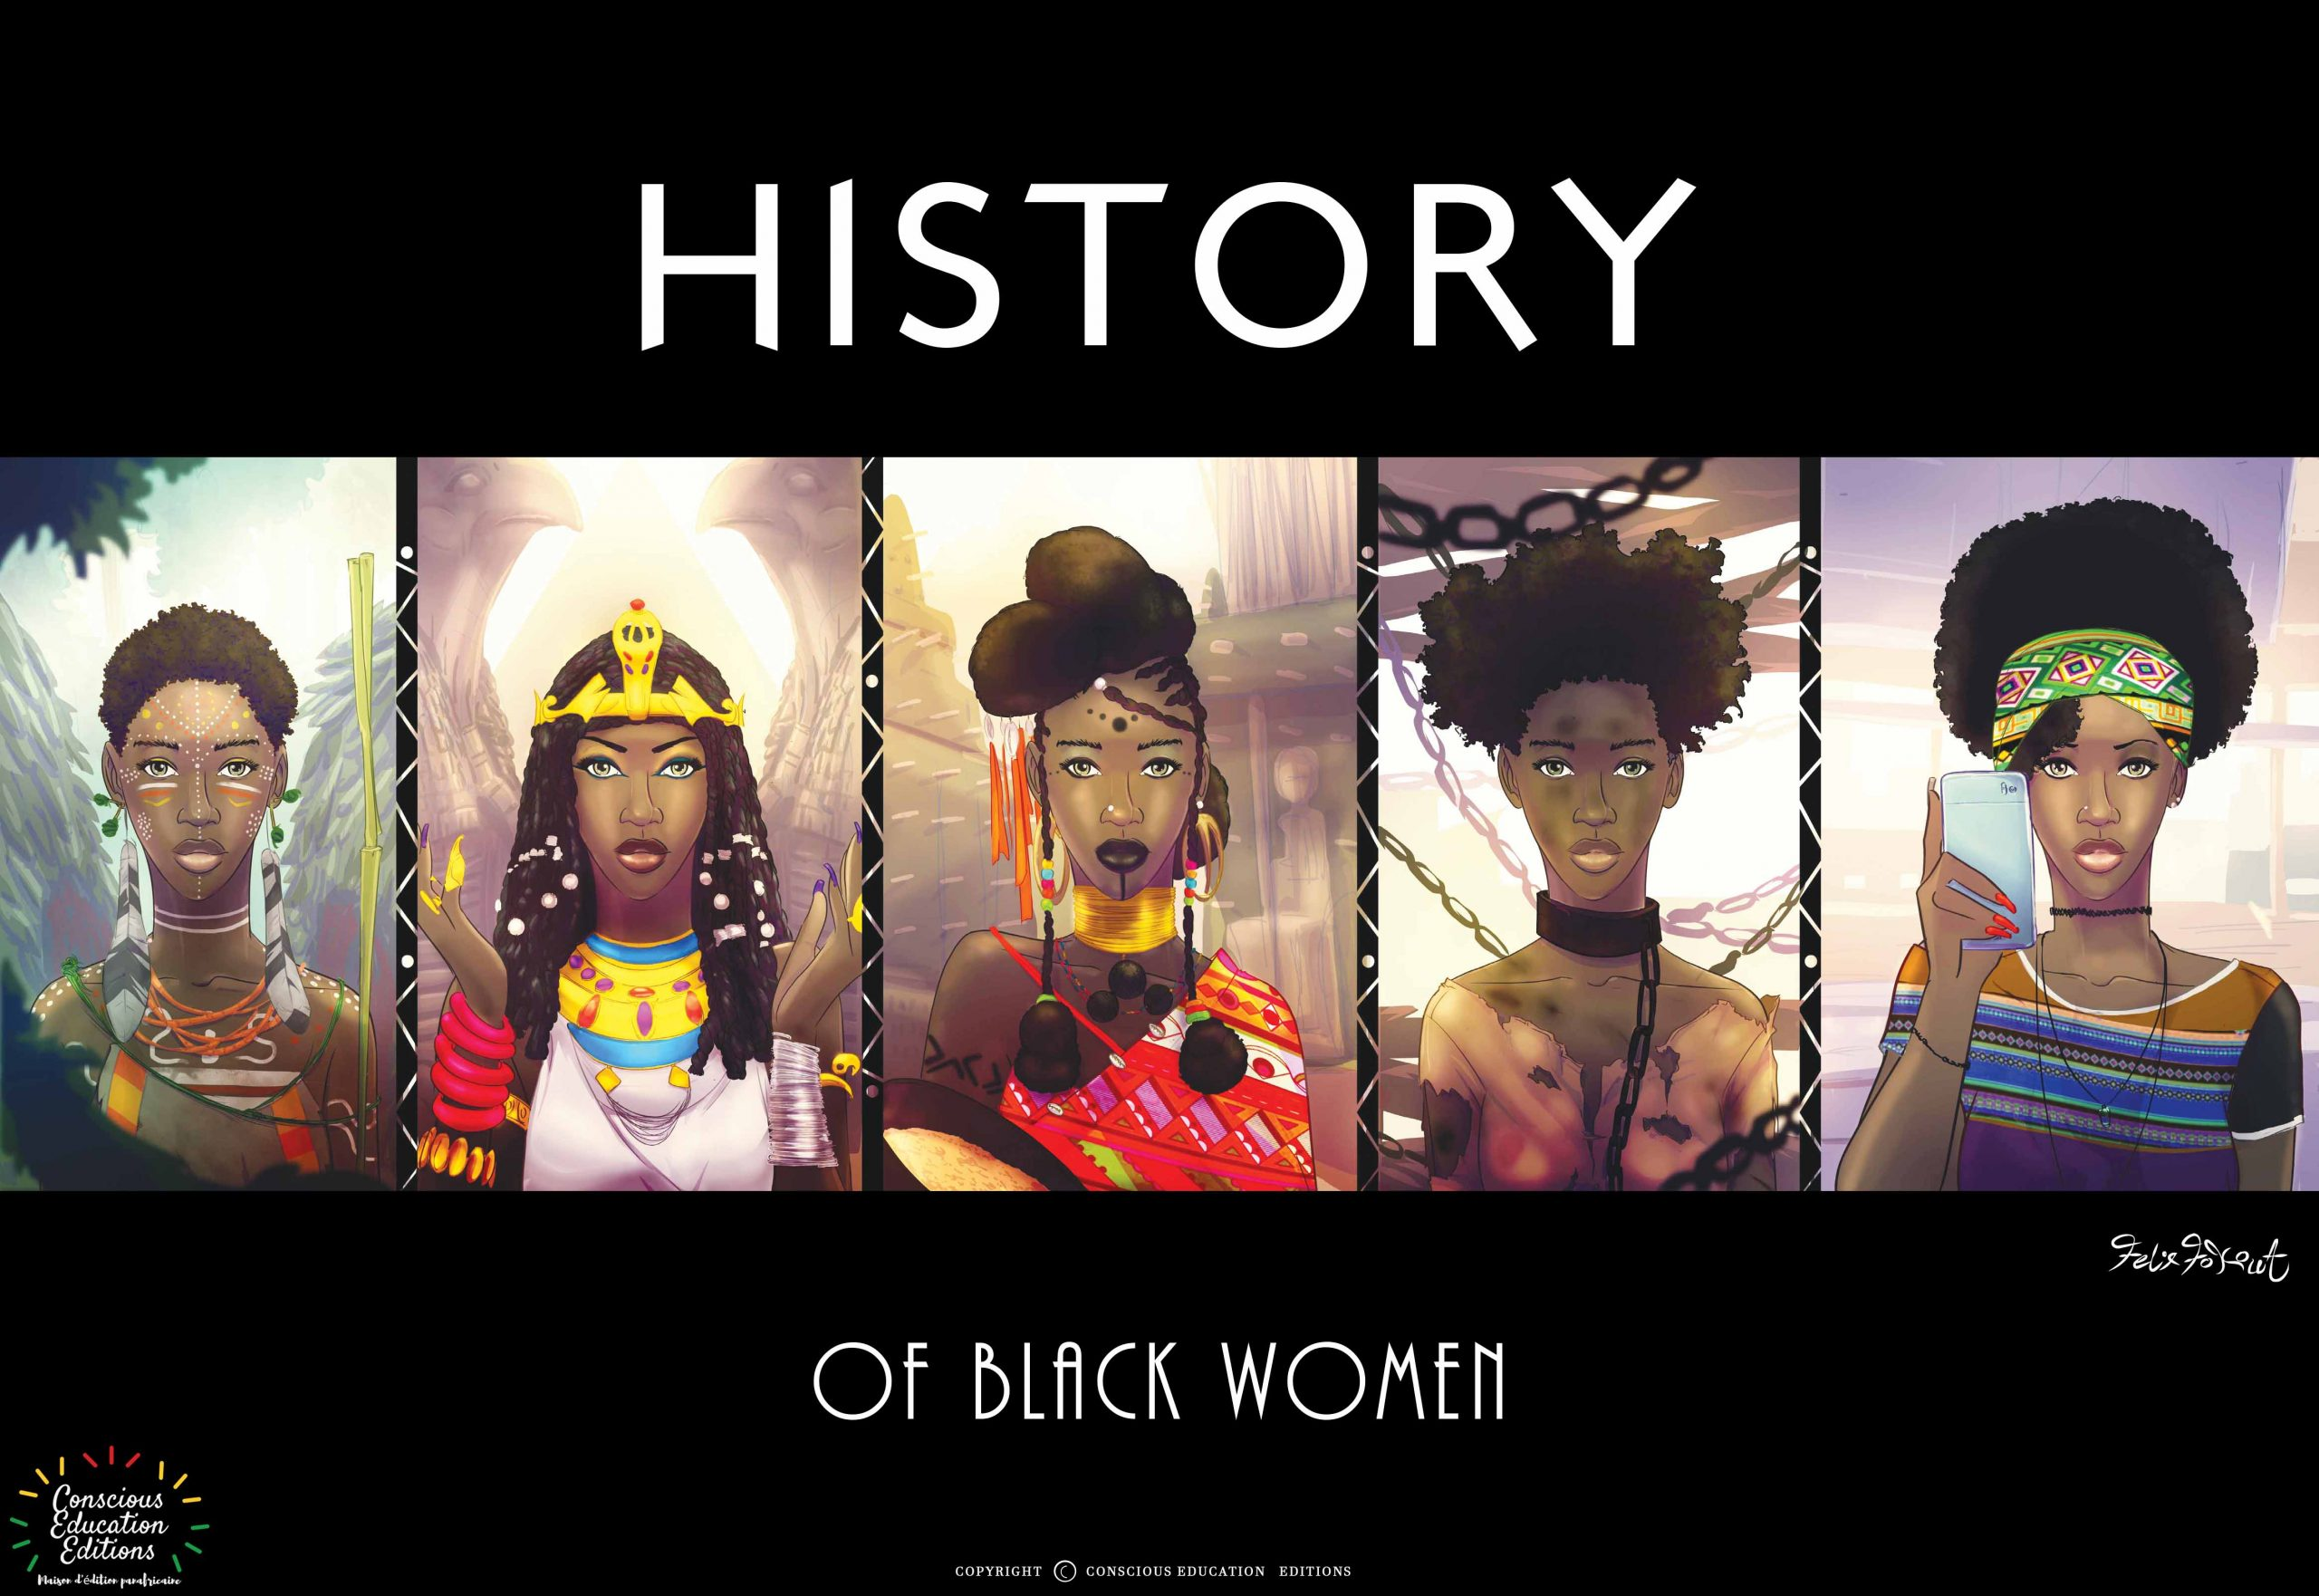 HISTORY OF Black women-Afro